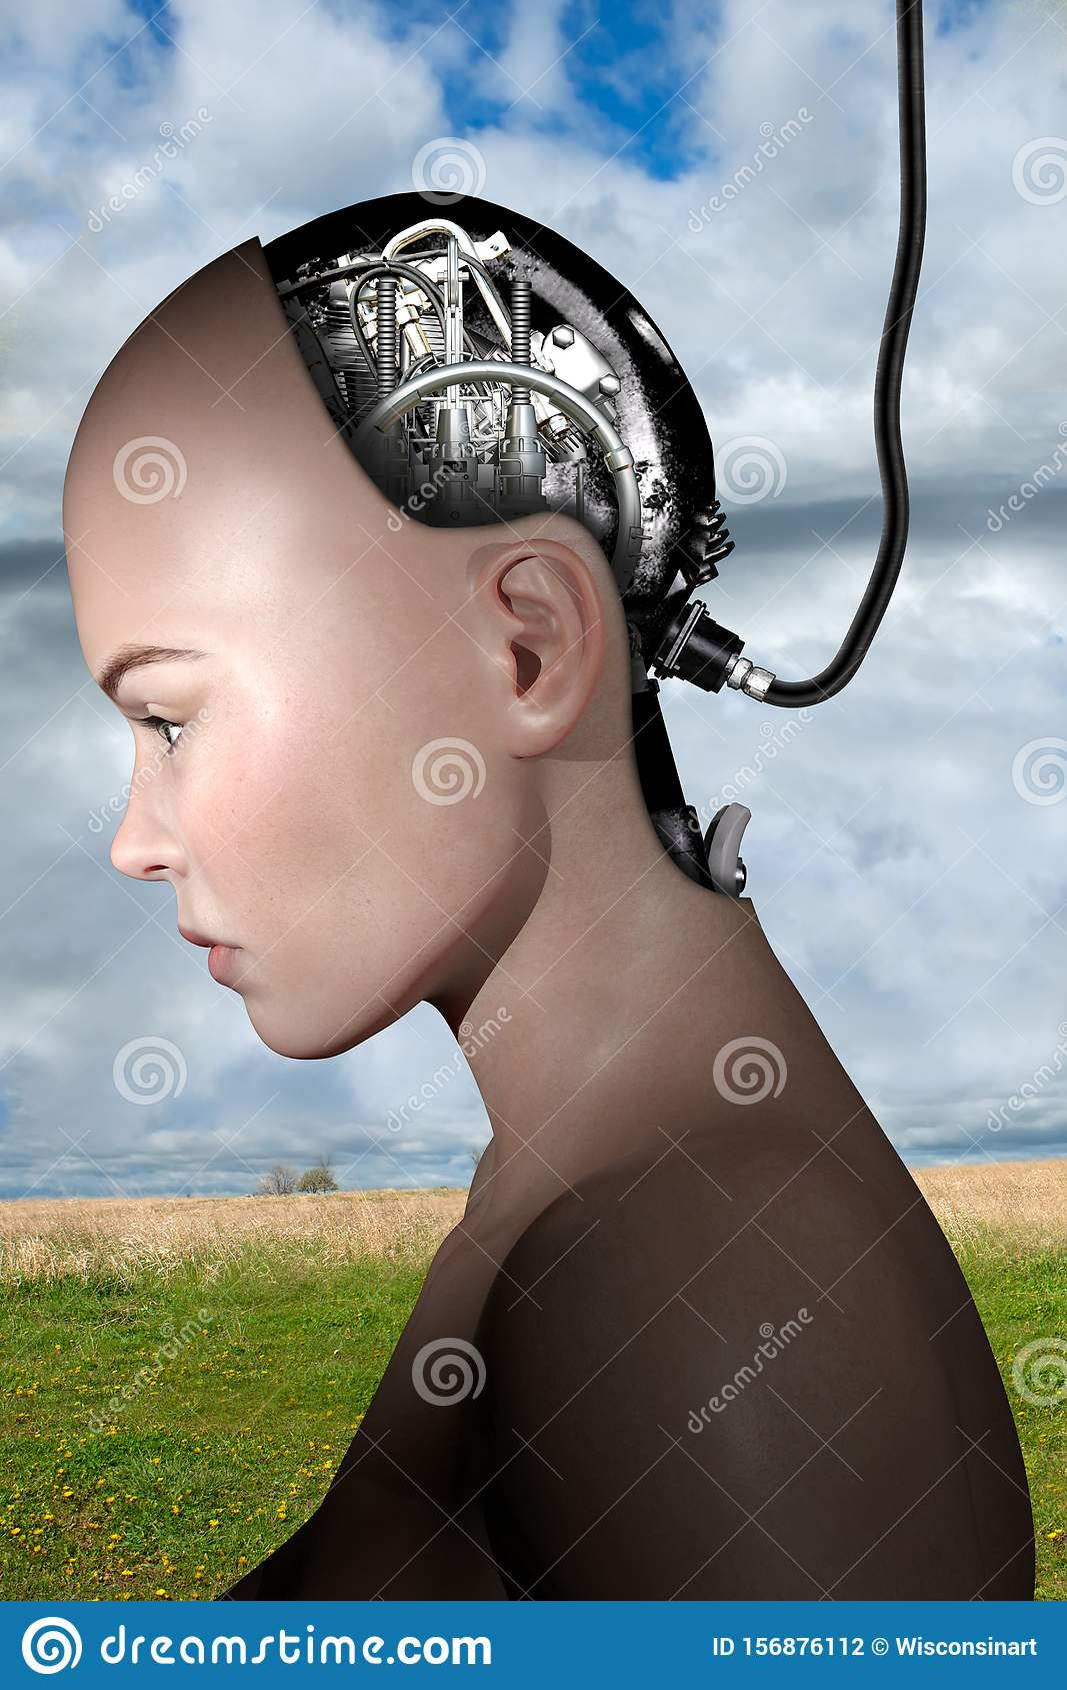 Surreal Science Fiction Robot Woman